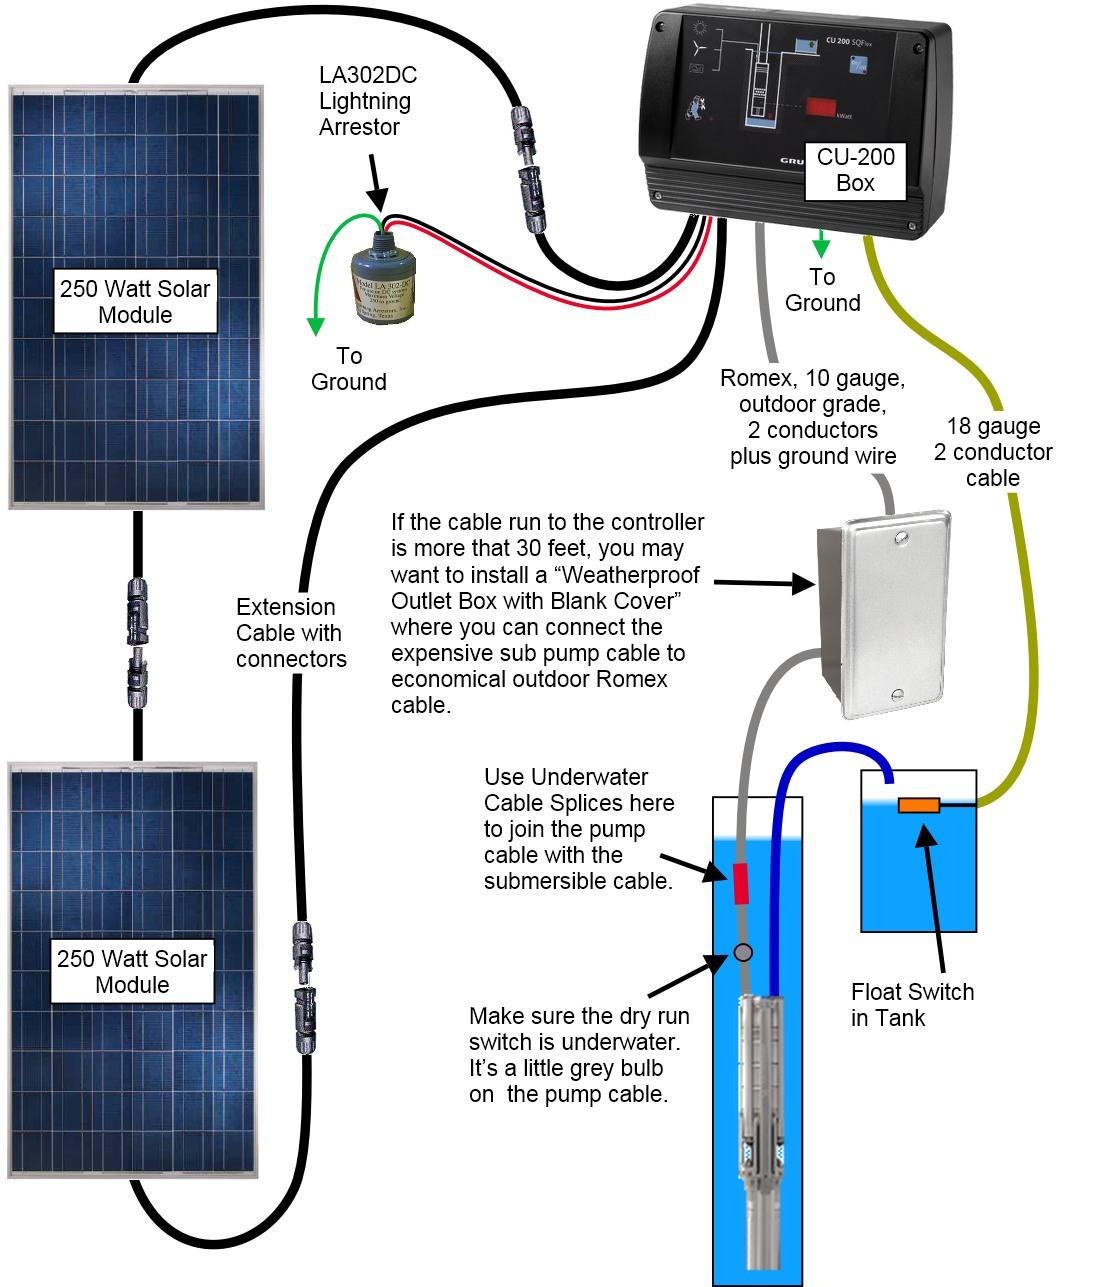 Solar Panel Wiring Diagrams Pdf Detailed Schematics Diagram Light Panels Diy Enthusiasts U2022